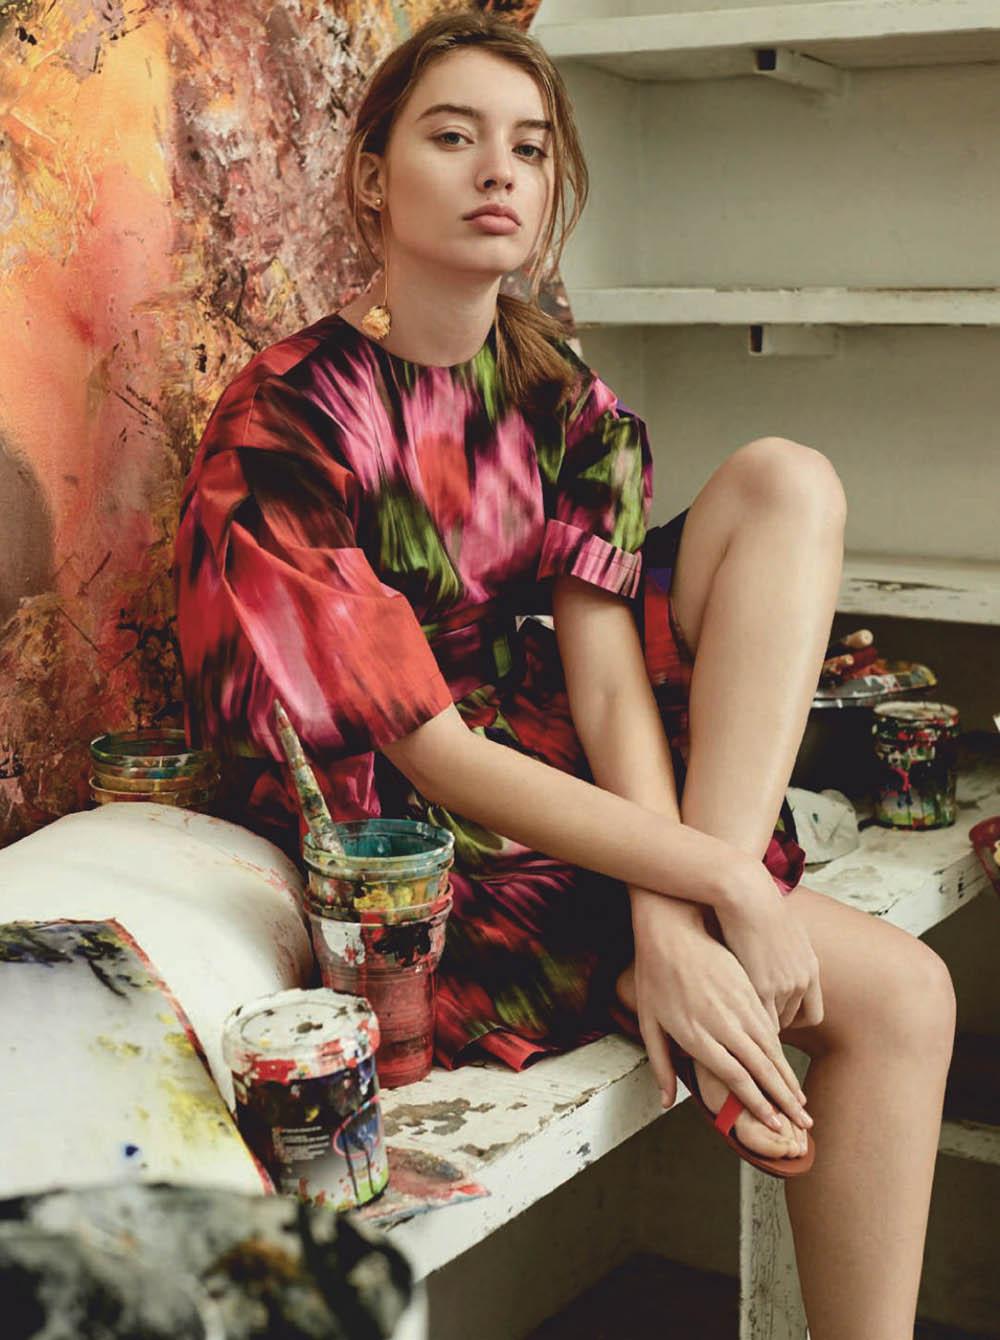 Giulia Maenza by Agata Pospieszynska for Harper's Bazaar Spain February 2020